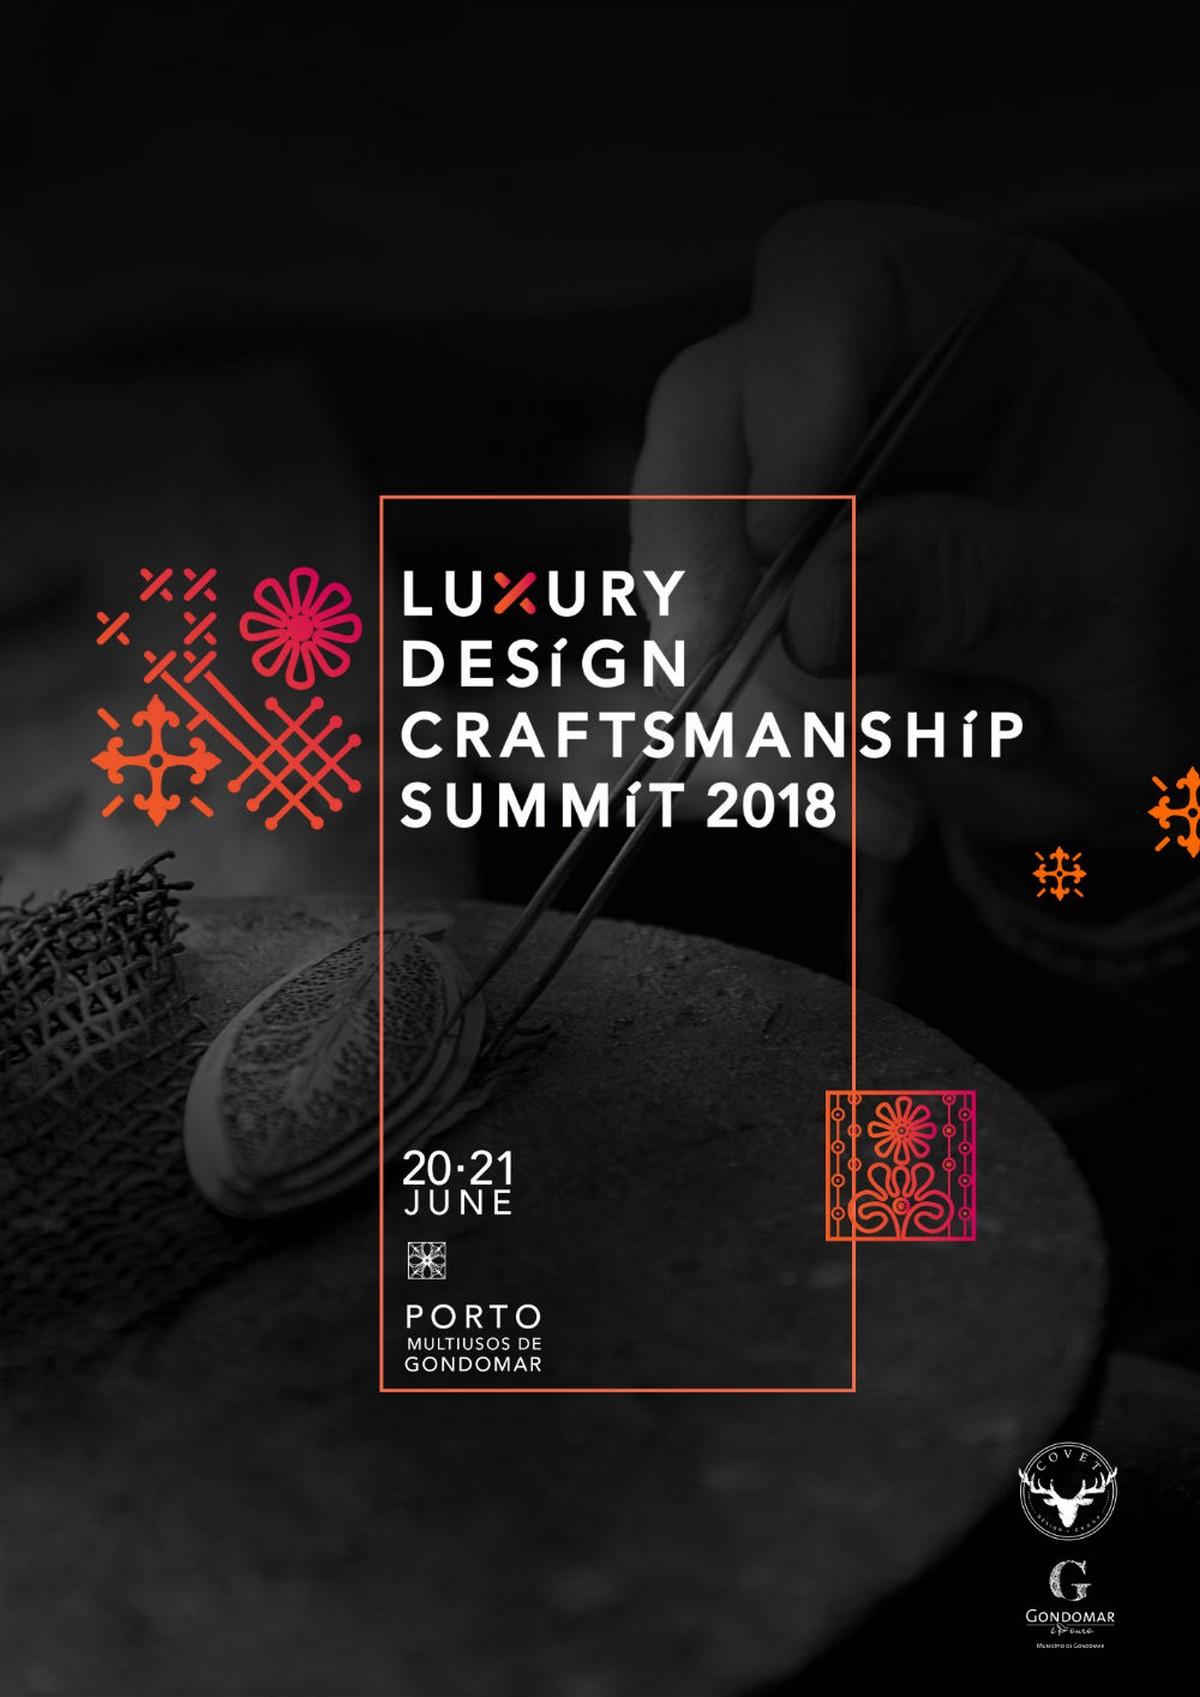 Luxury Design & Craftsmanship Summit 2018: Unmissable Event In Oporto Craftsmanship Luxury Design & Craftsmanship Summit 2018: Unmissable Event In Oporto 2 11